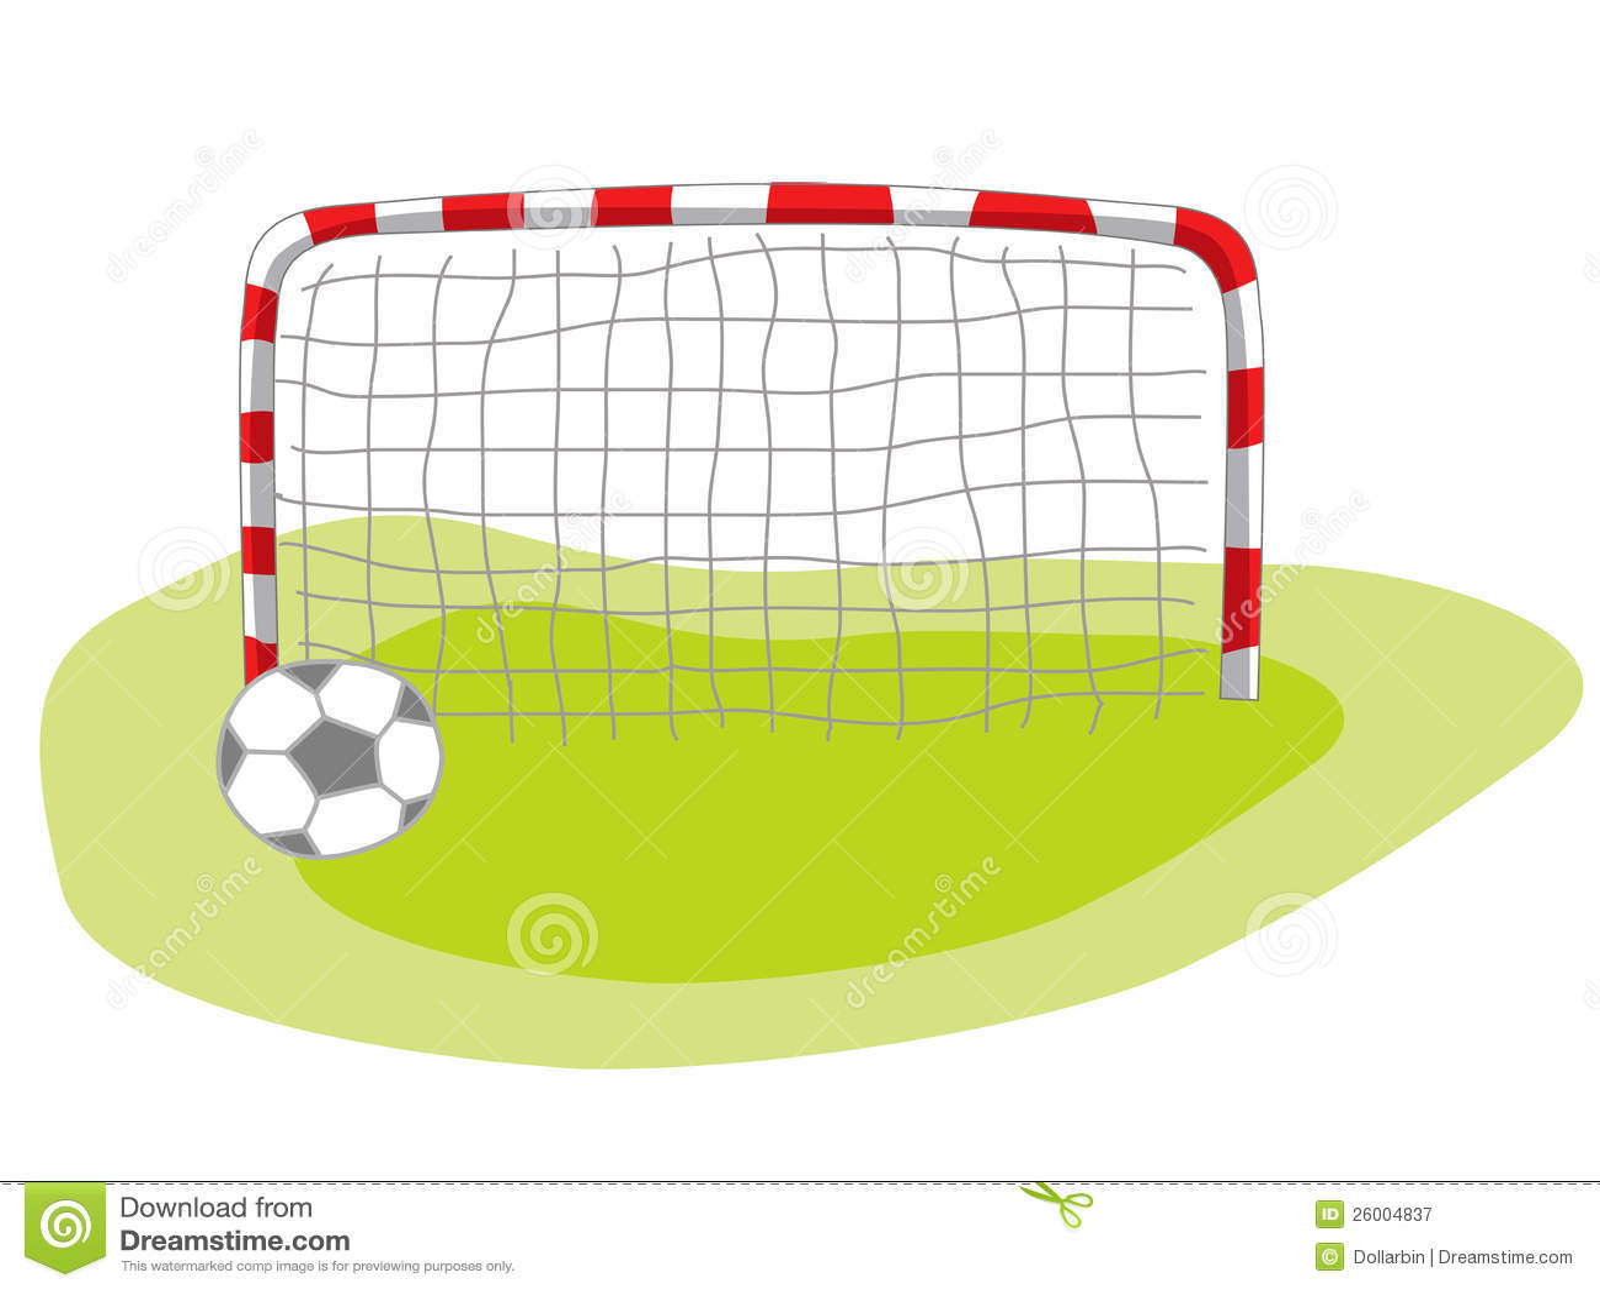 football net clipart - photo #35